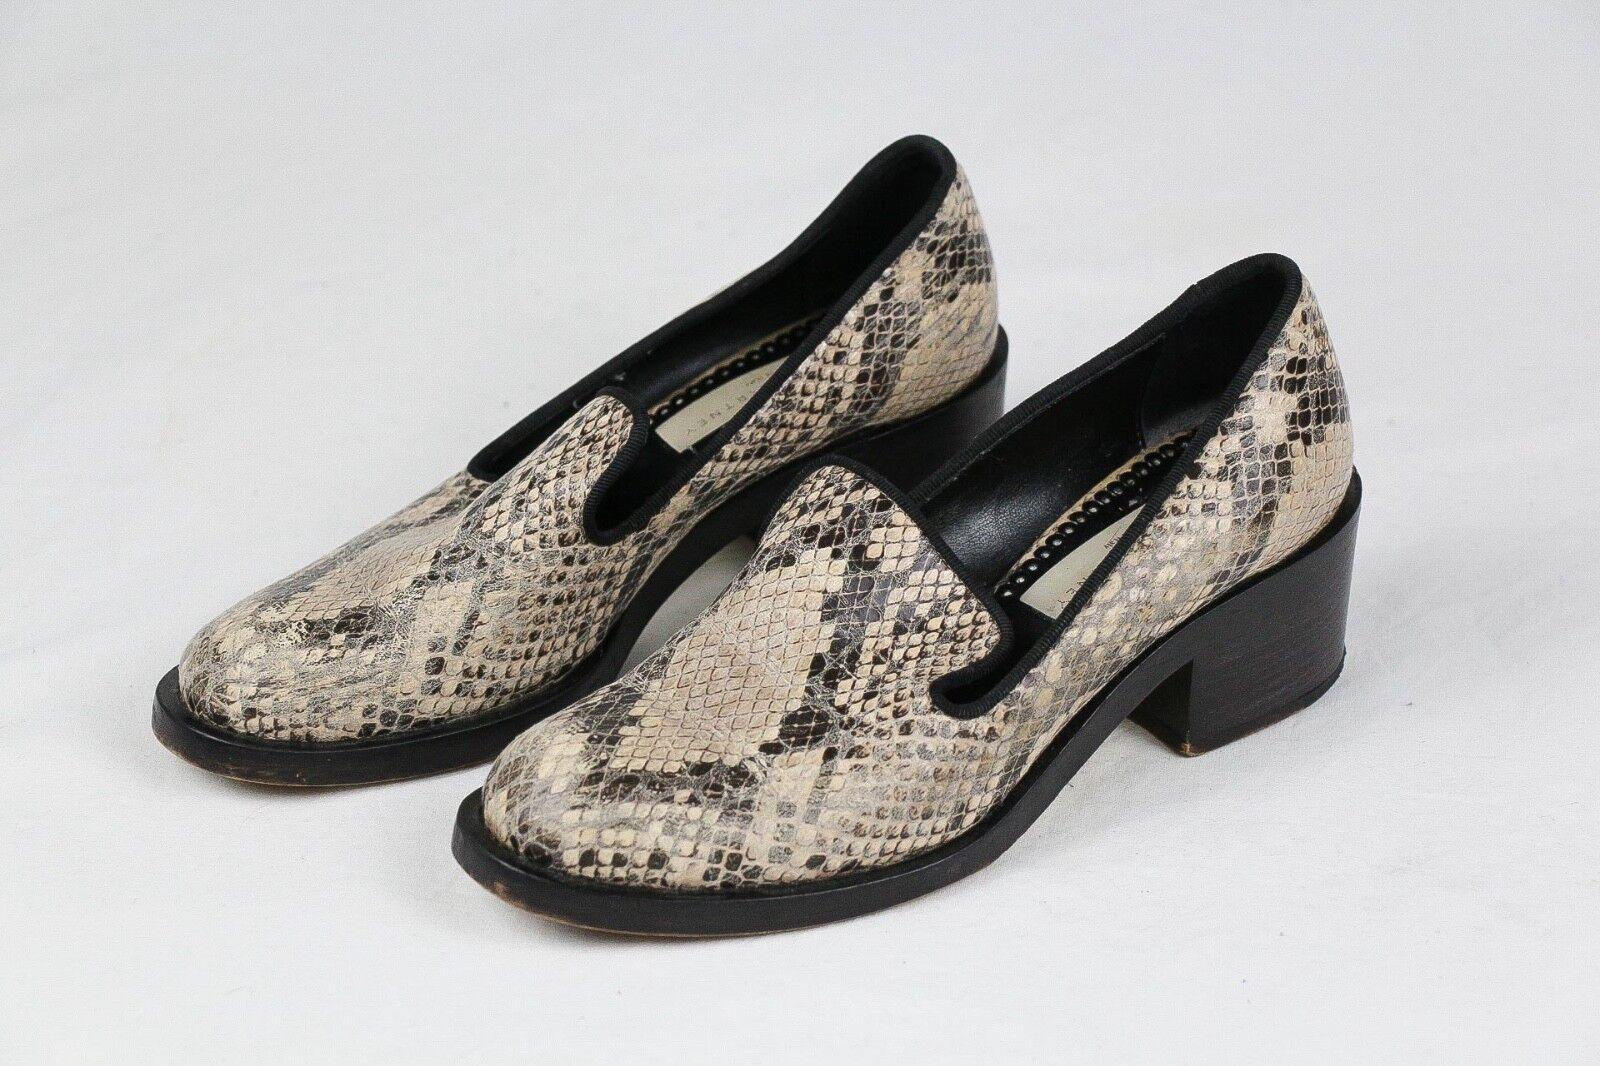 Stella McCartney Snakeskin Python Faux Leder Loafer Schuhes Block Heel Sz EU 37